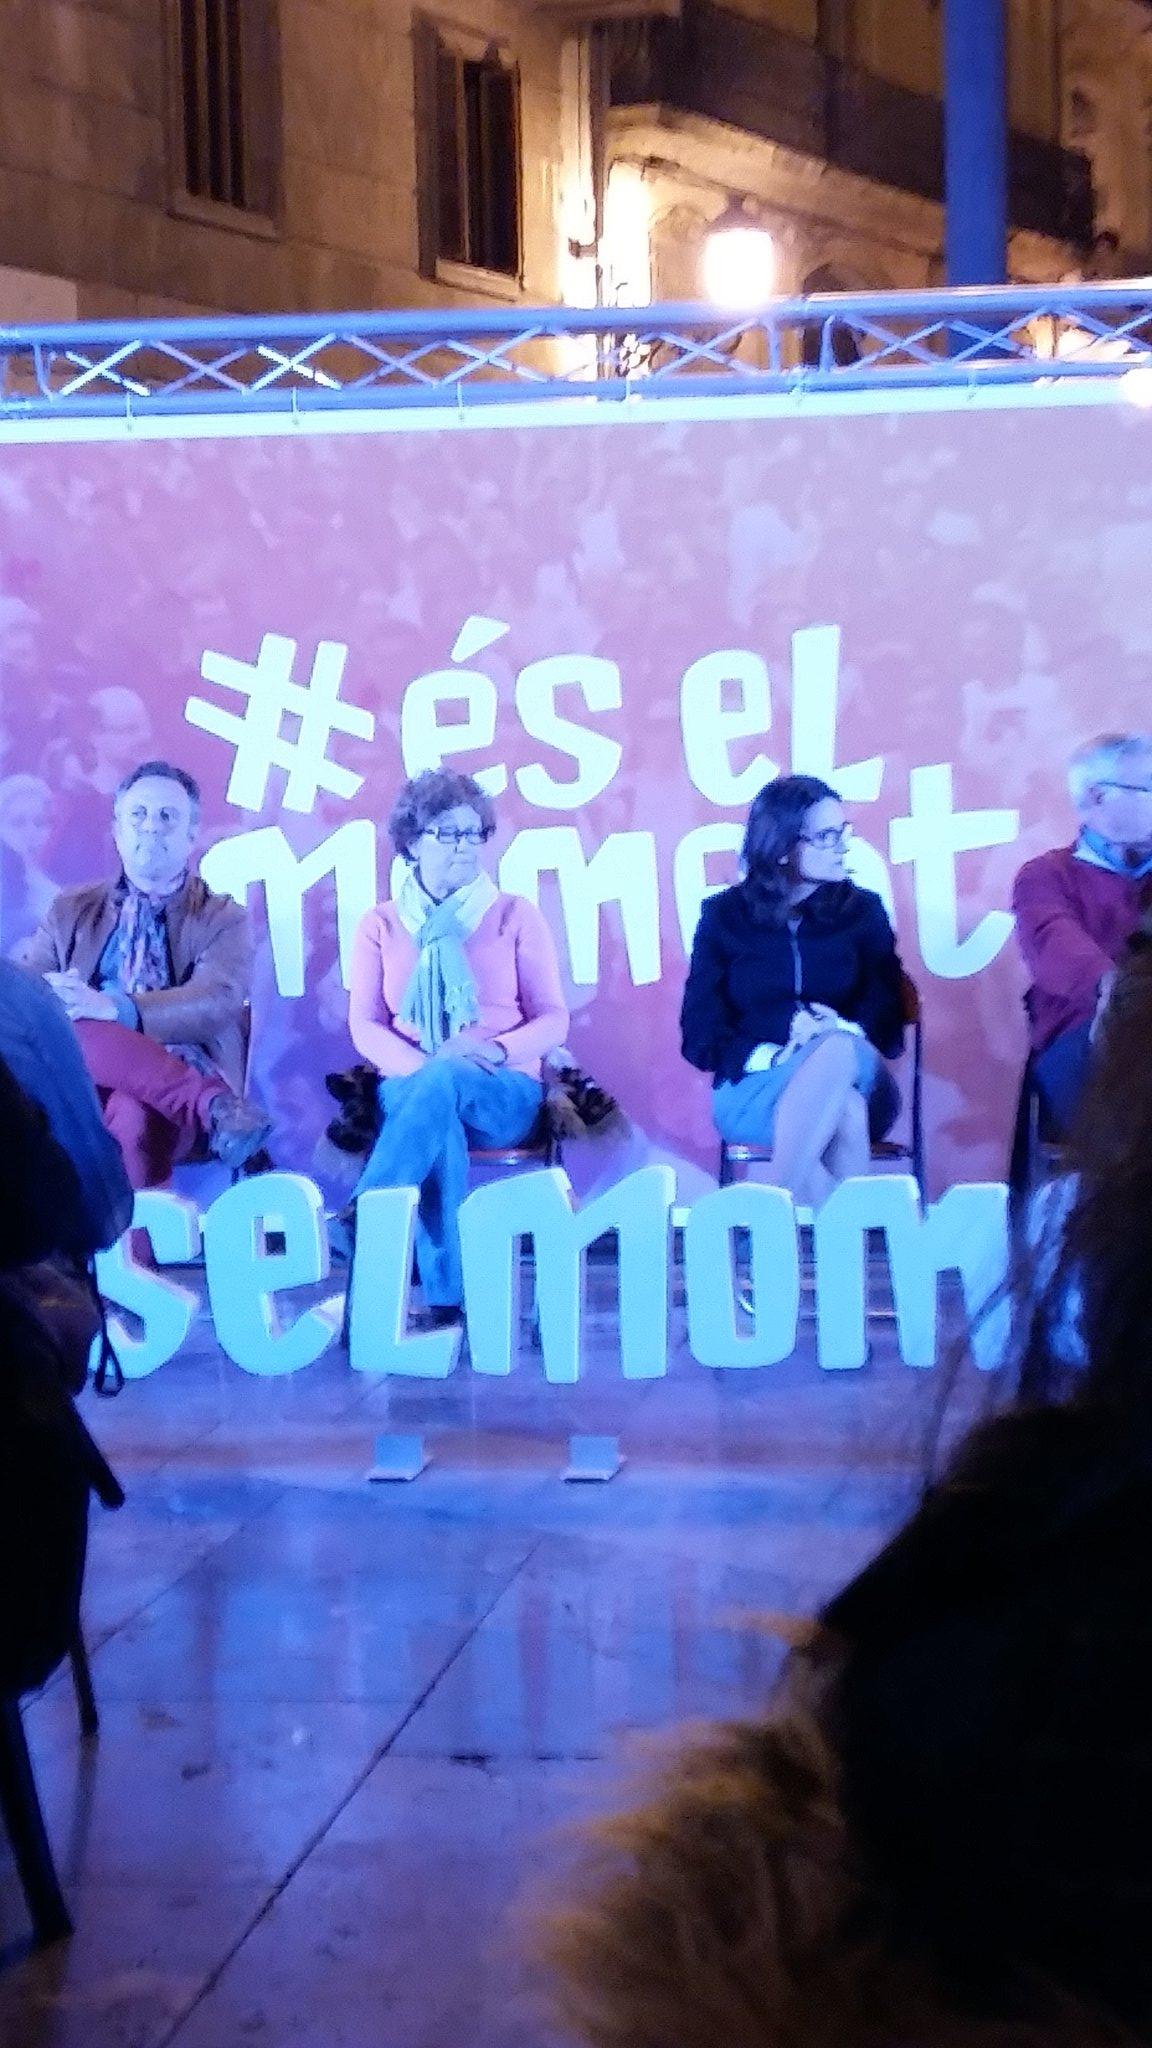 Ahora mismo en Valencia mítin ciudadano #éselmoment @EsElMoment @monicaoltra @joanribo https://t.co/coDAOMuWf5